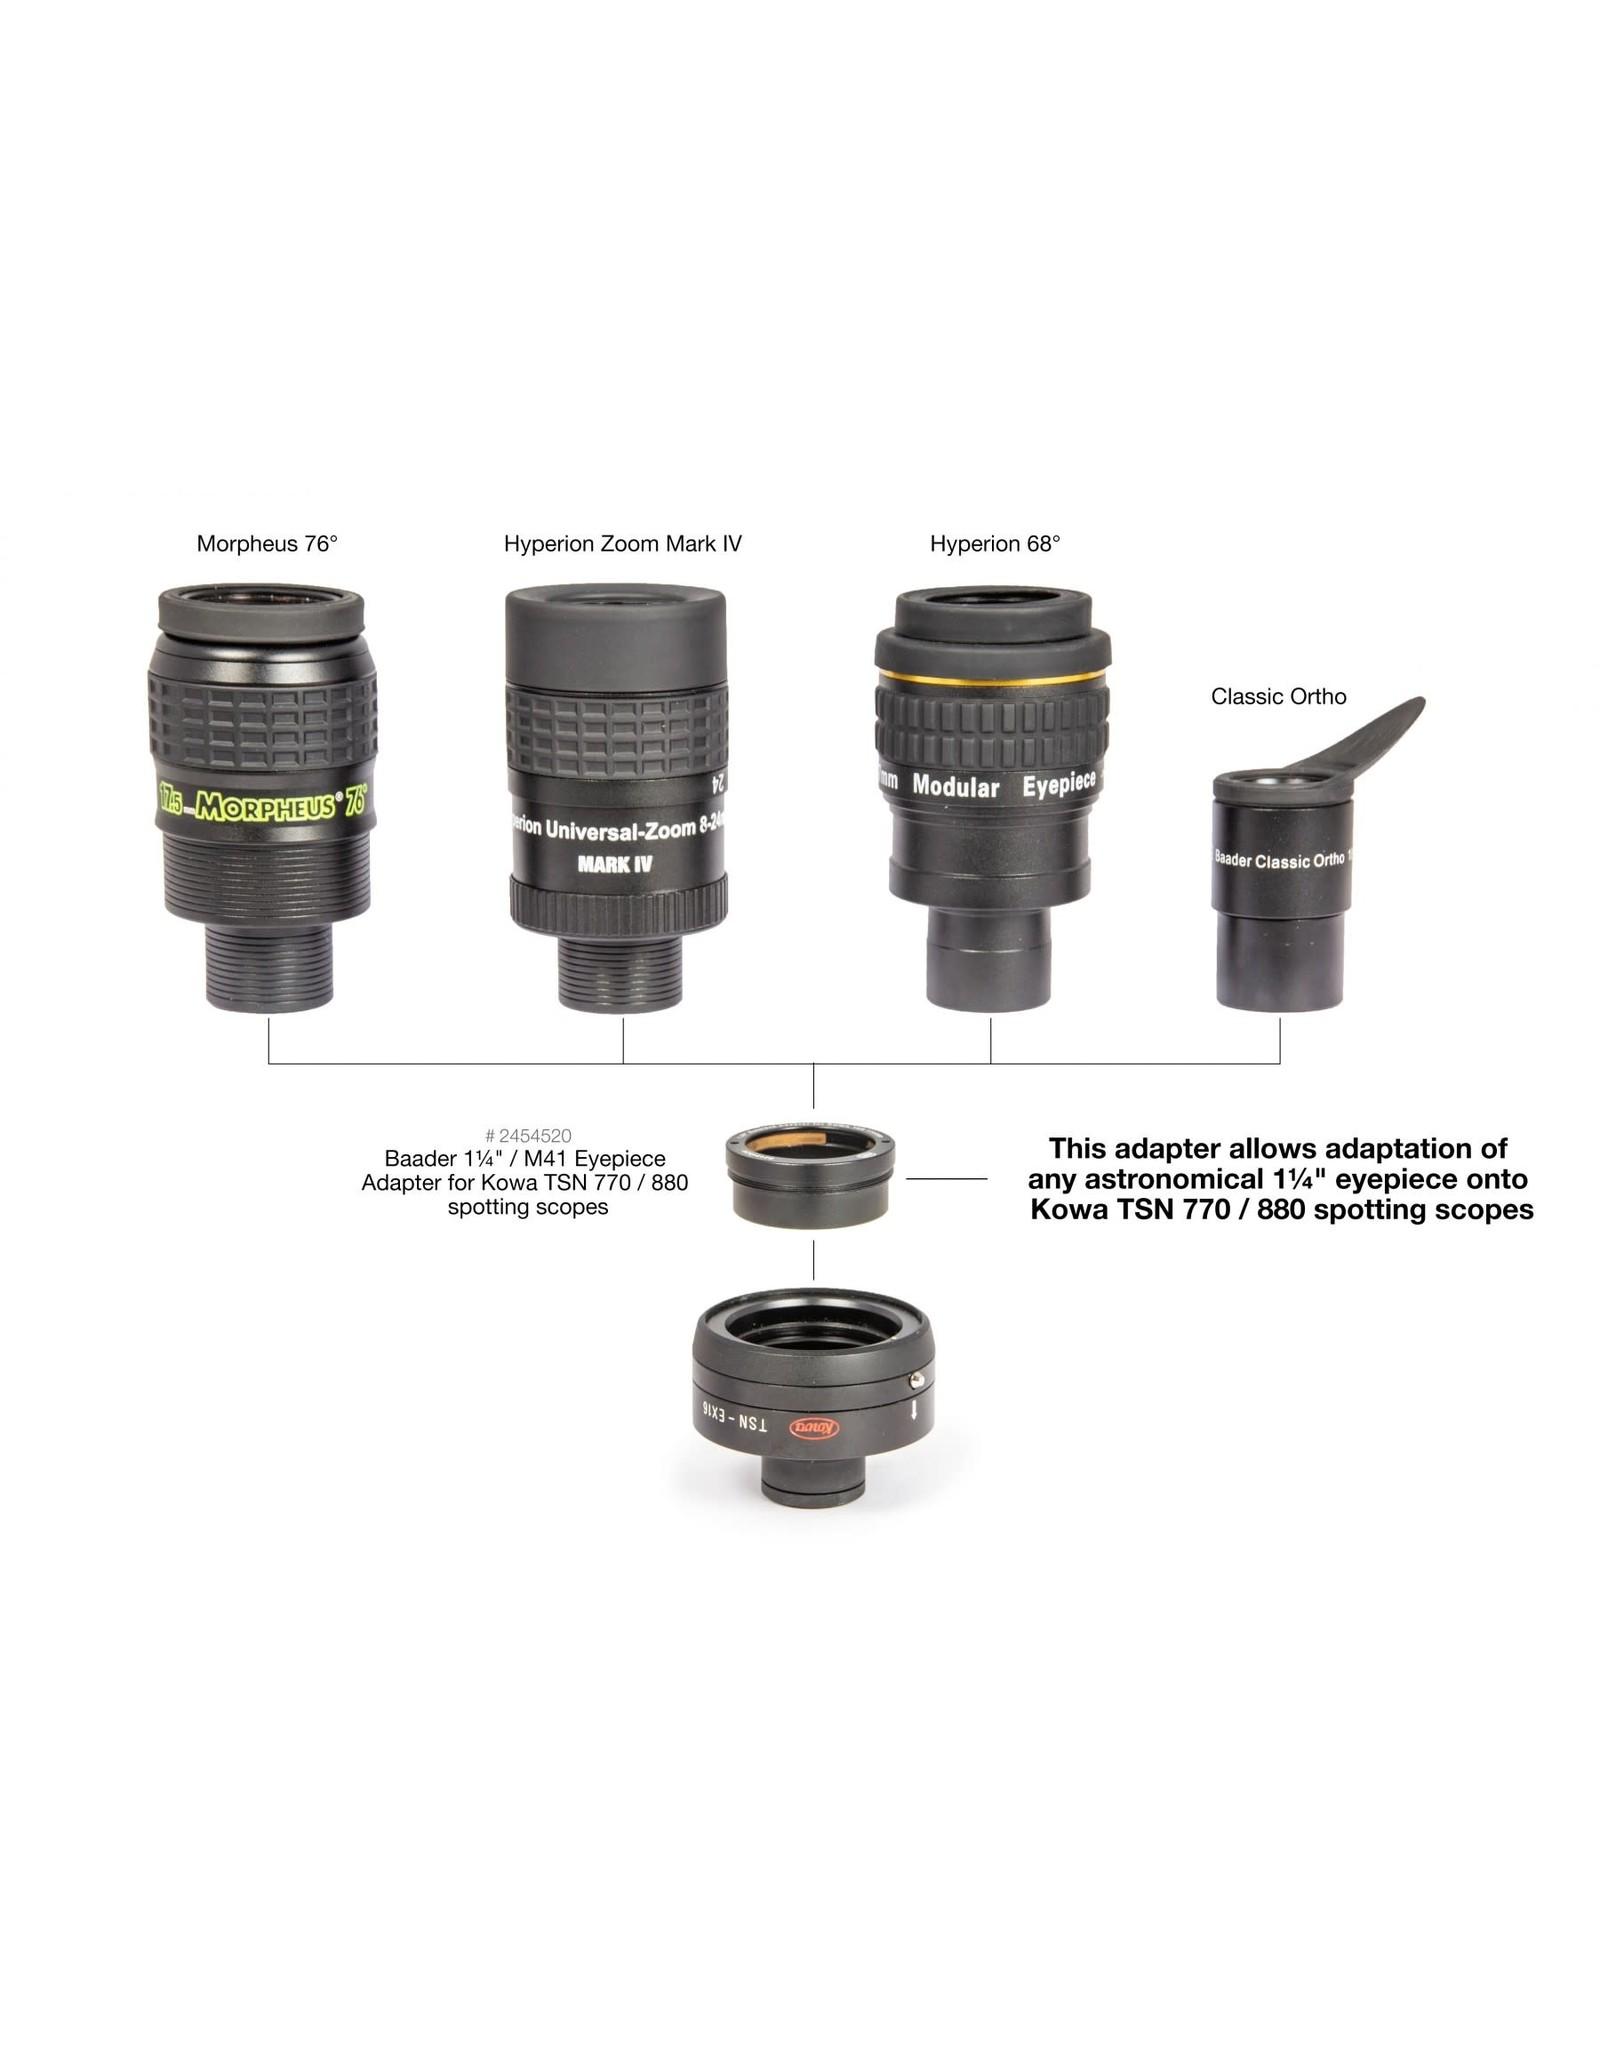 "Baader Planetarium 1¼"" / M41 Eyepiece-Adapter for Kowa TSN 770 / 880 Spotting Scopes"